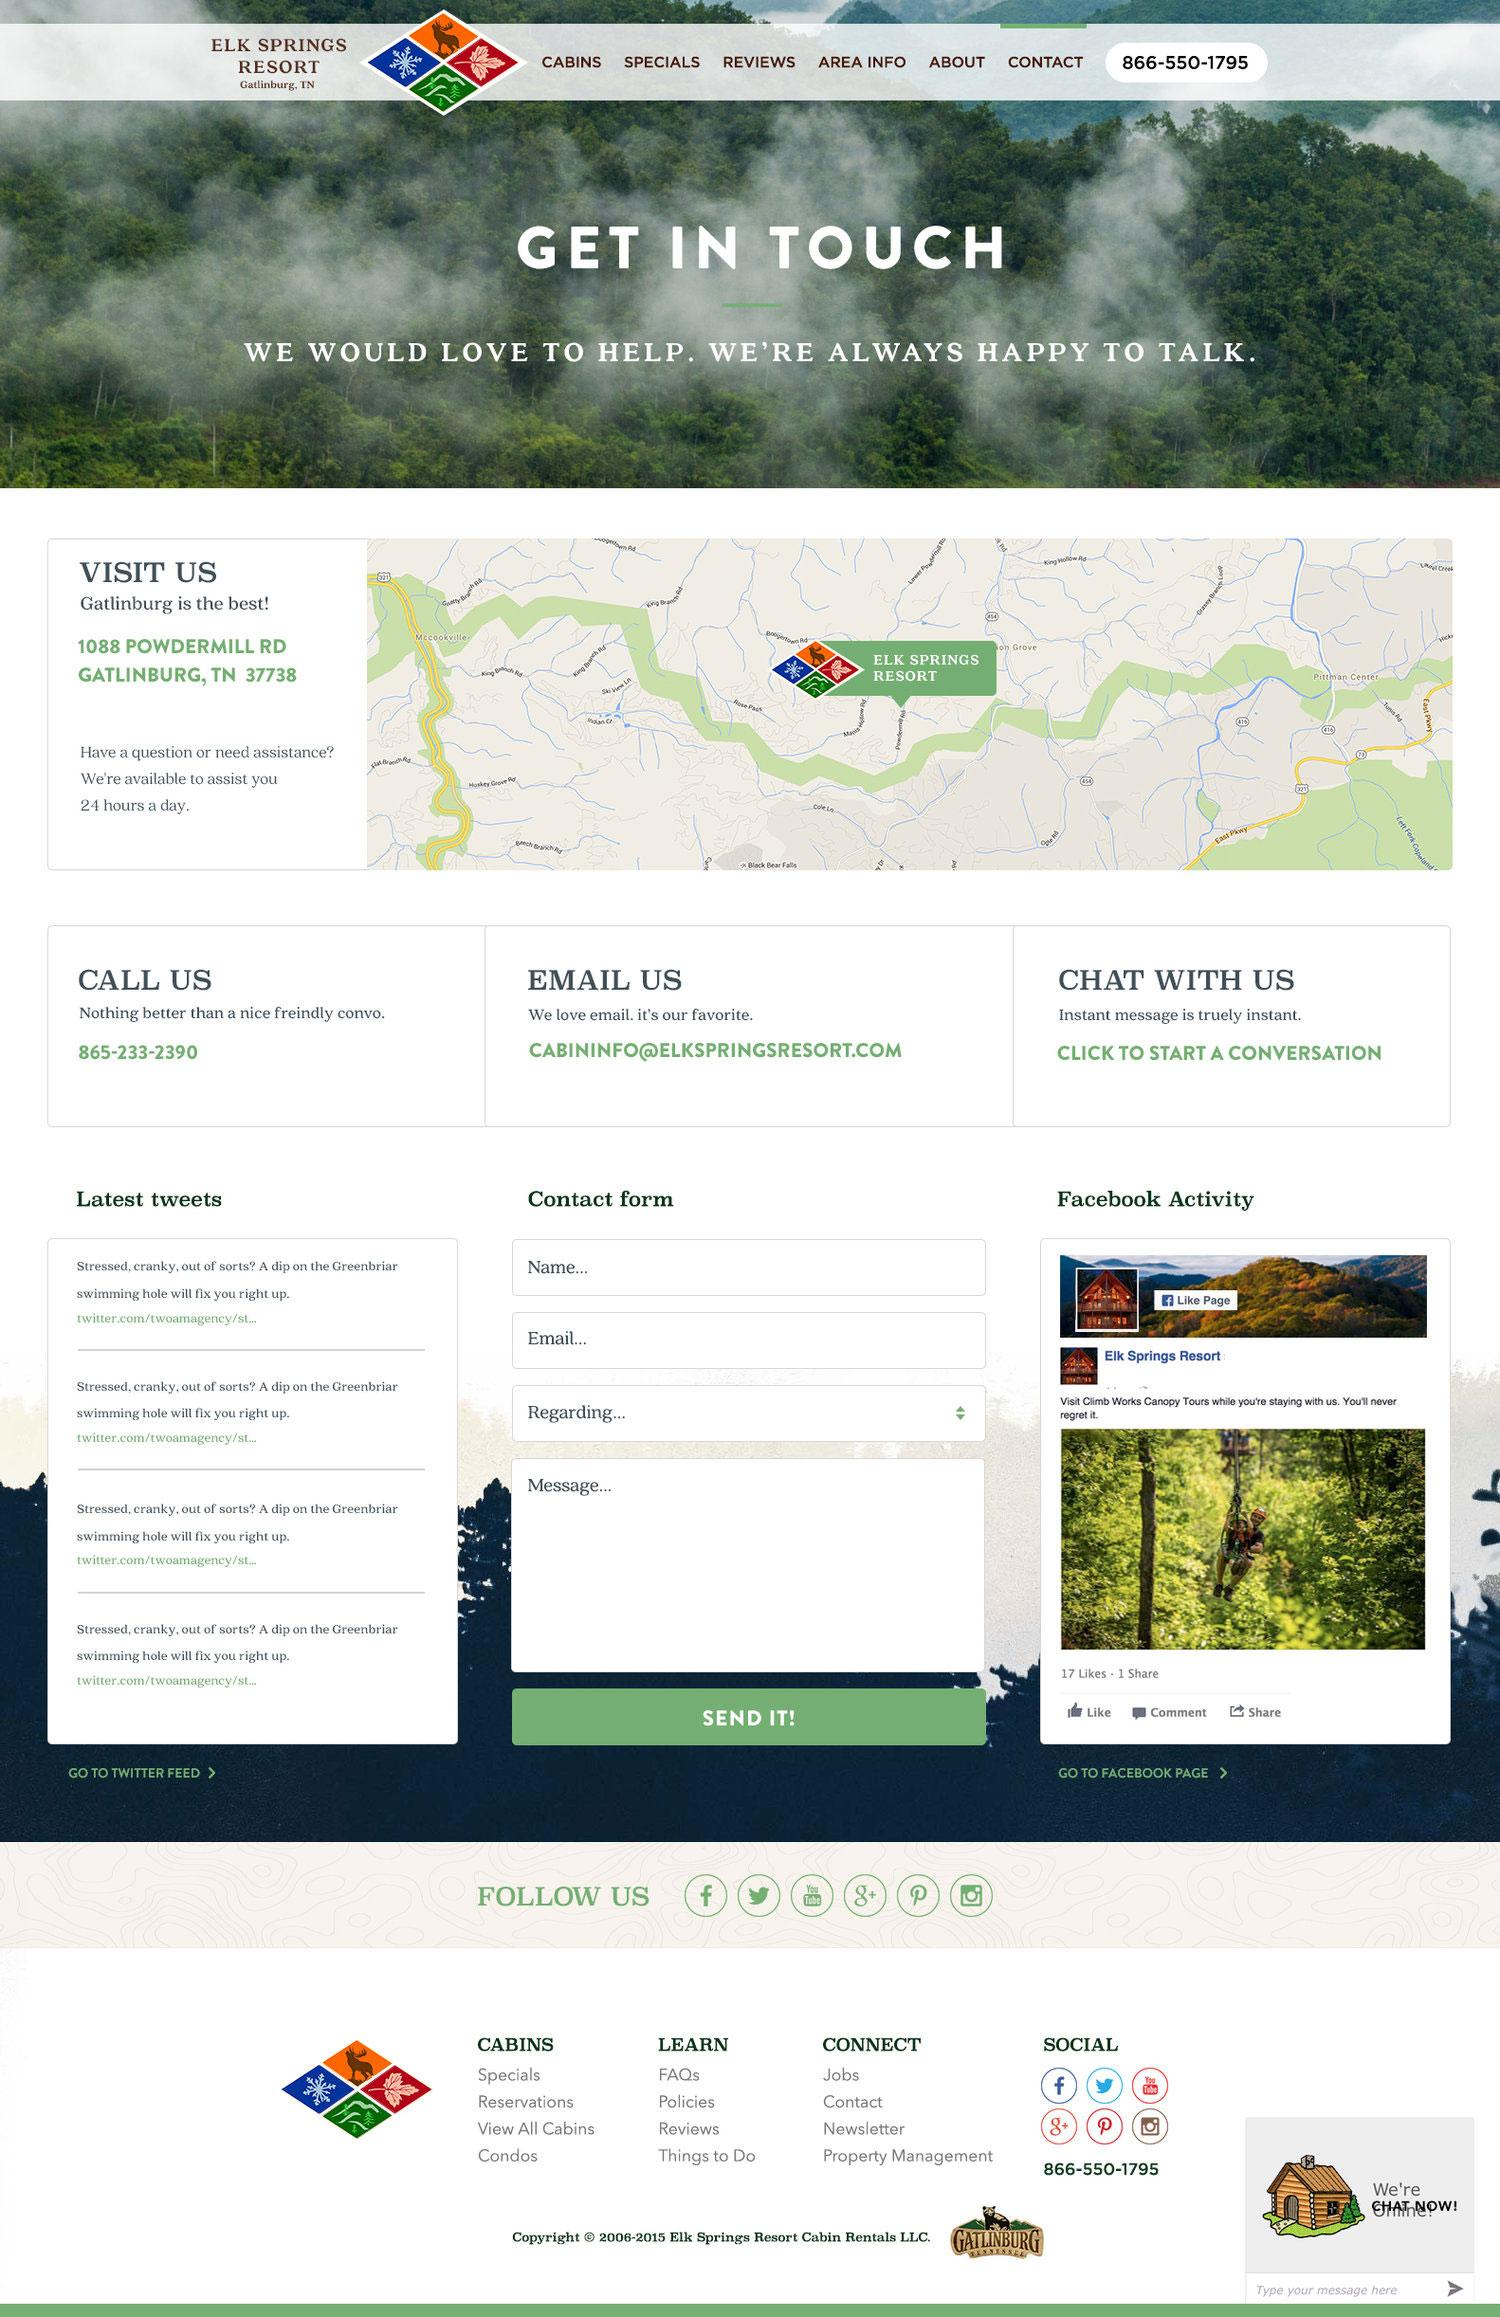 Web Design | Elk Springs Resort - Get In Touch (Desktop View)